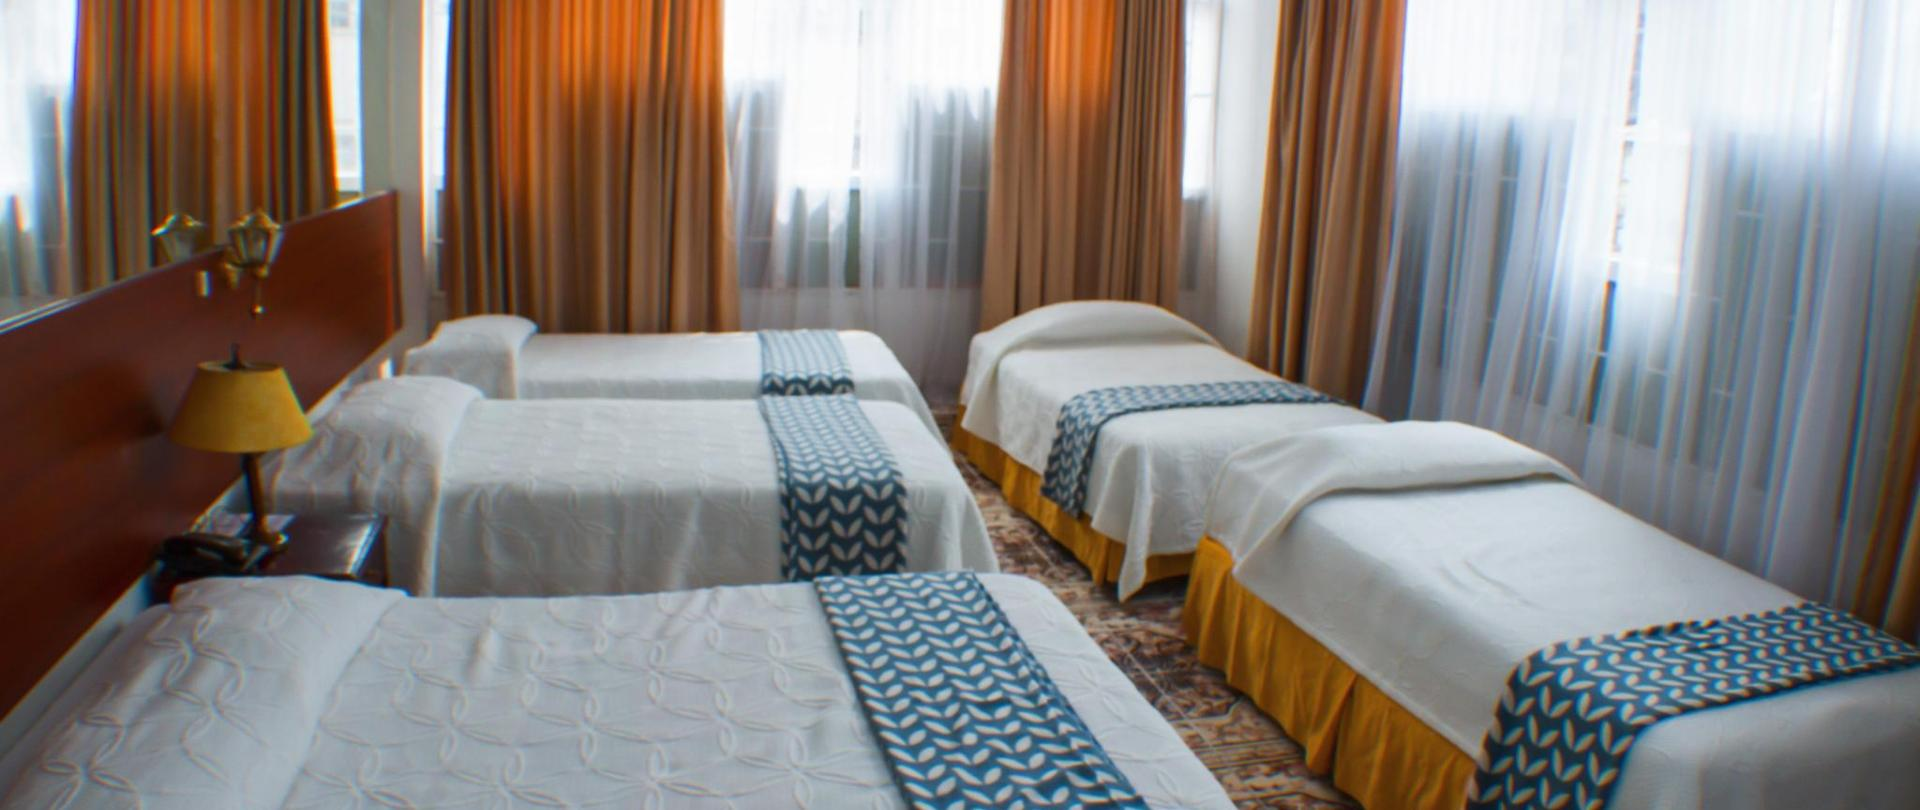 Hotel_Siar-8556.jpg